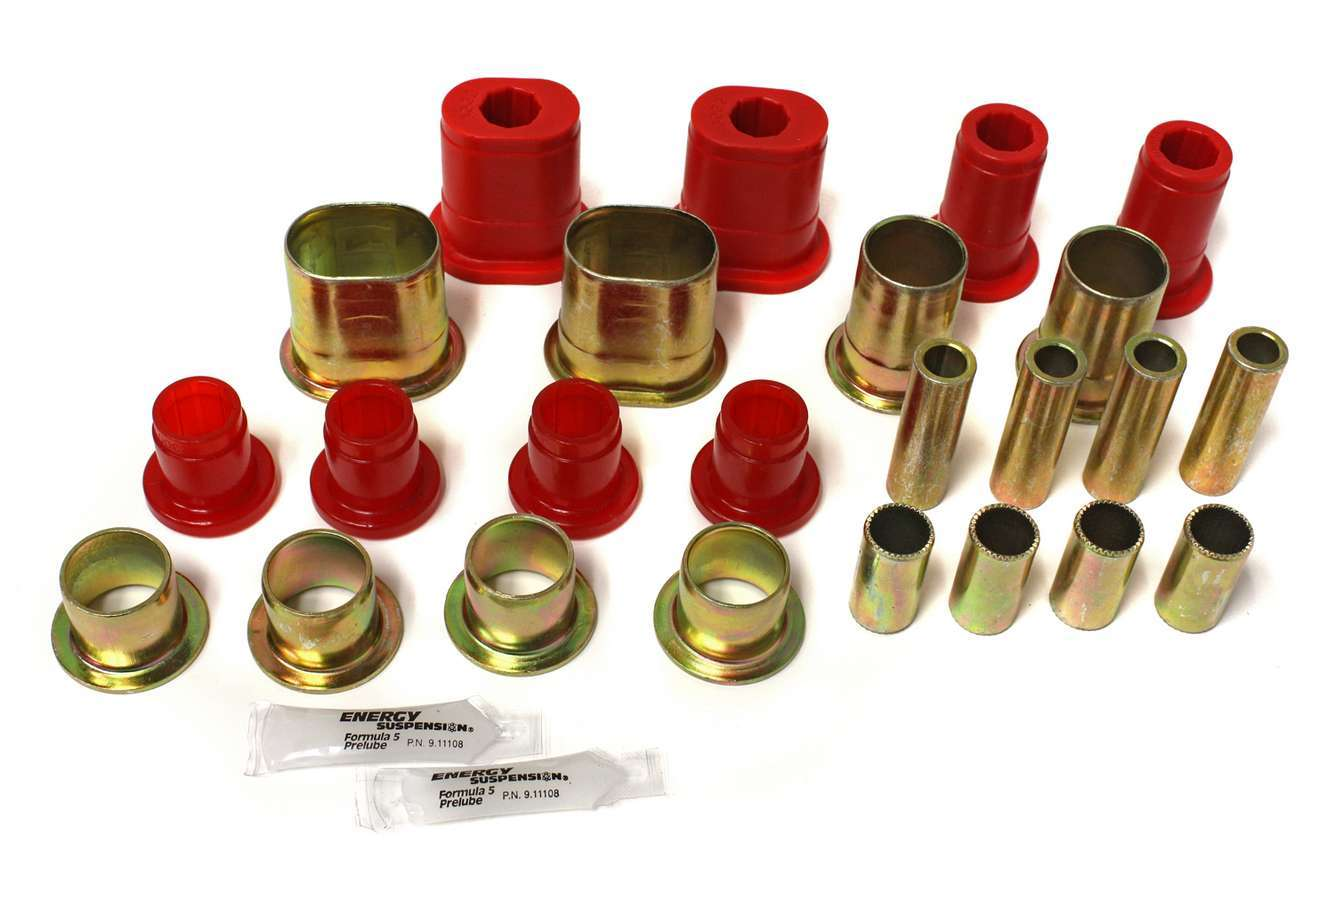 Energy Suspension 3-3172R Control Arm Bushing, Hyper-Flex, Front, Lower / Upper, Polyurethane, Red, GM A-Body 1966-72, Kit